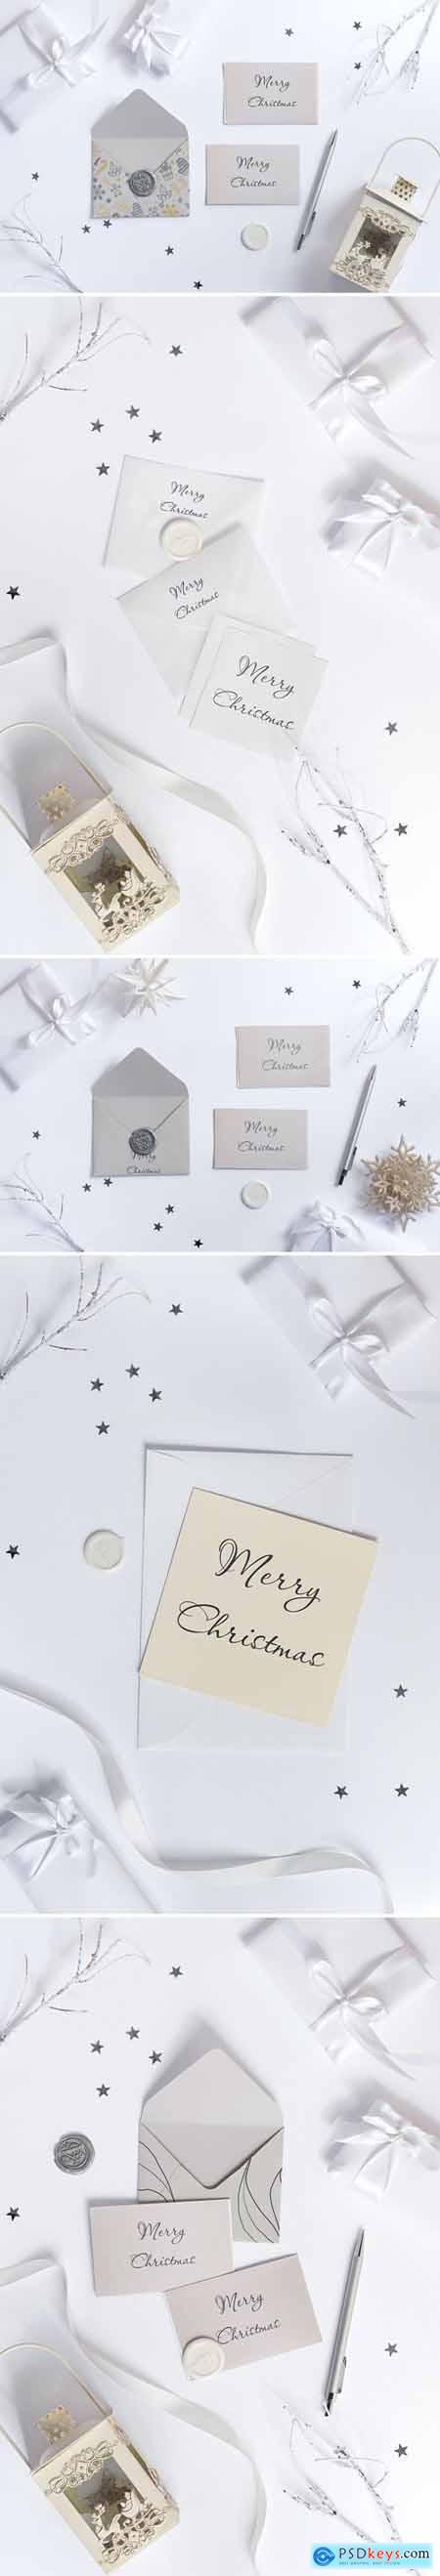 Christmas envelope and card mockup